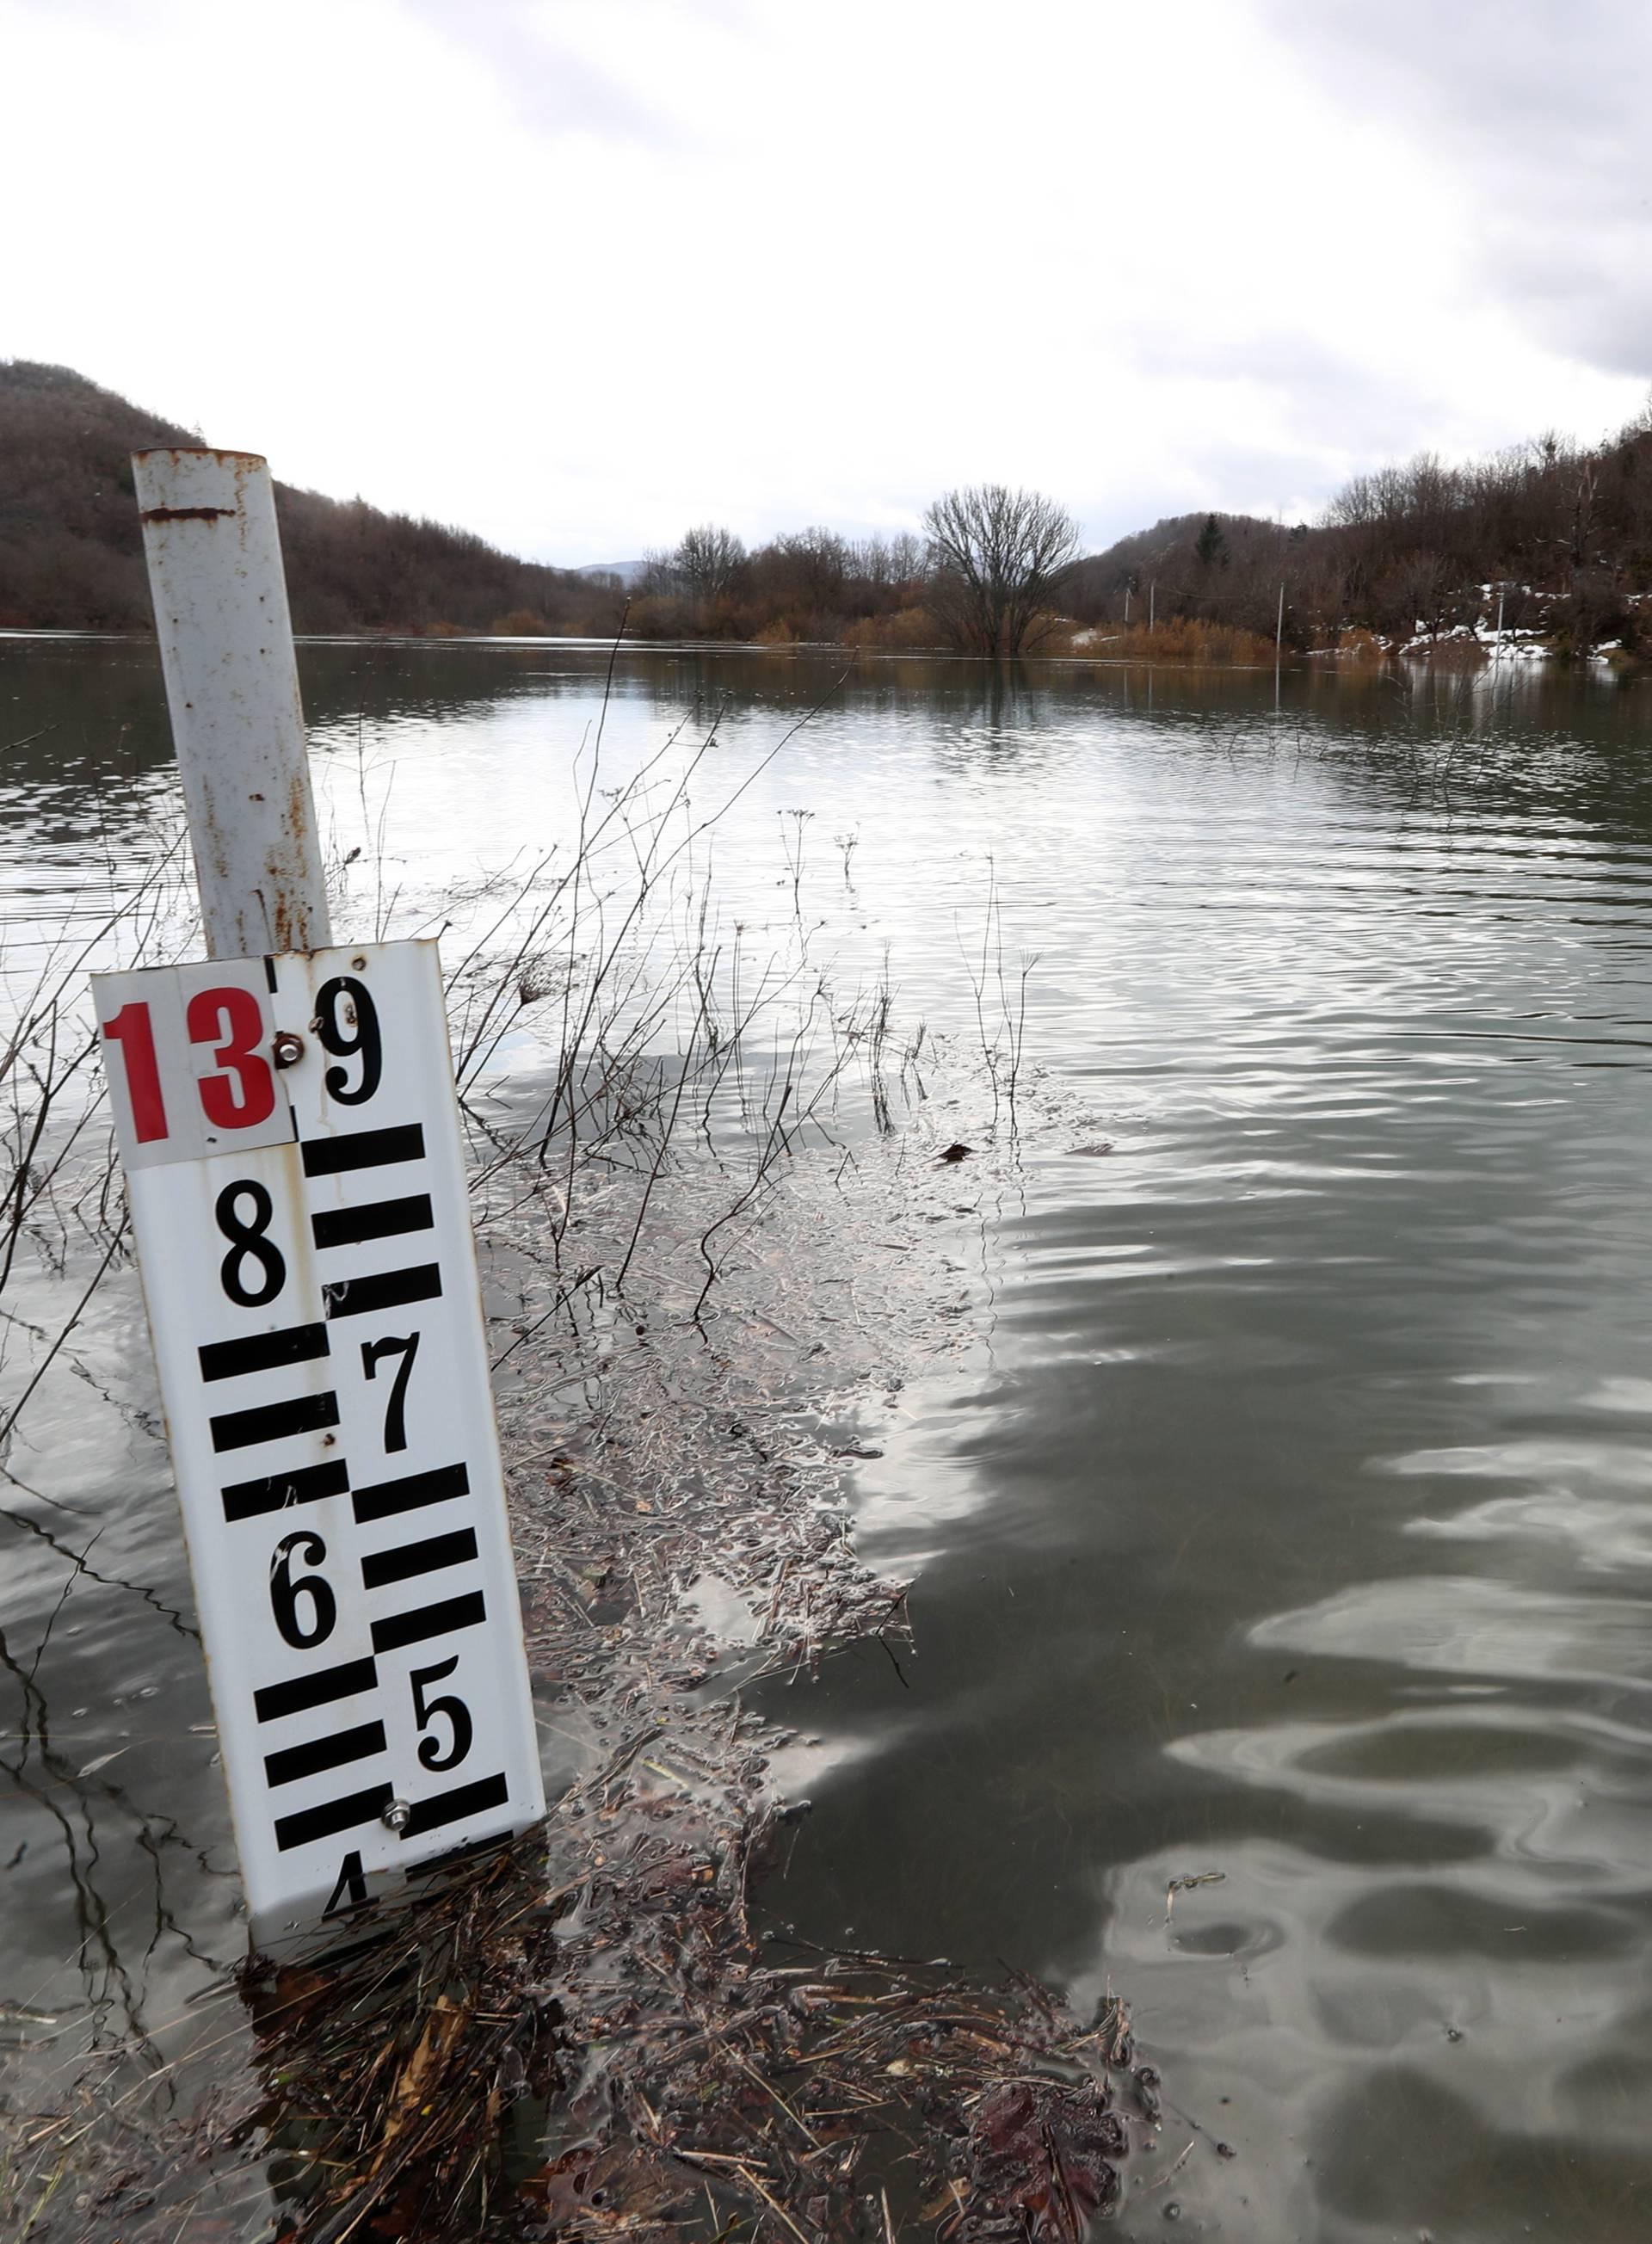 Izlila se Lika i poplavila Kosinj: U Jasenovcu se grade nasipi...